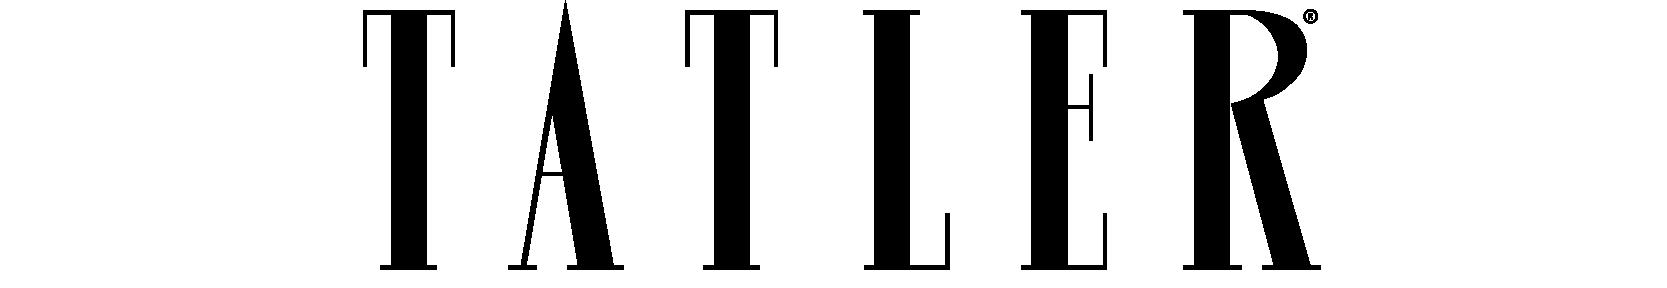 Press logos-03 copy_2.png